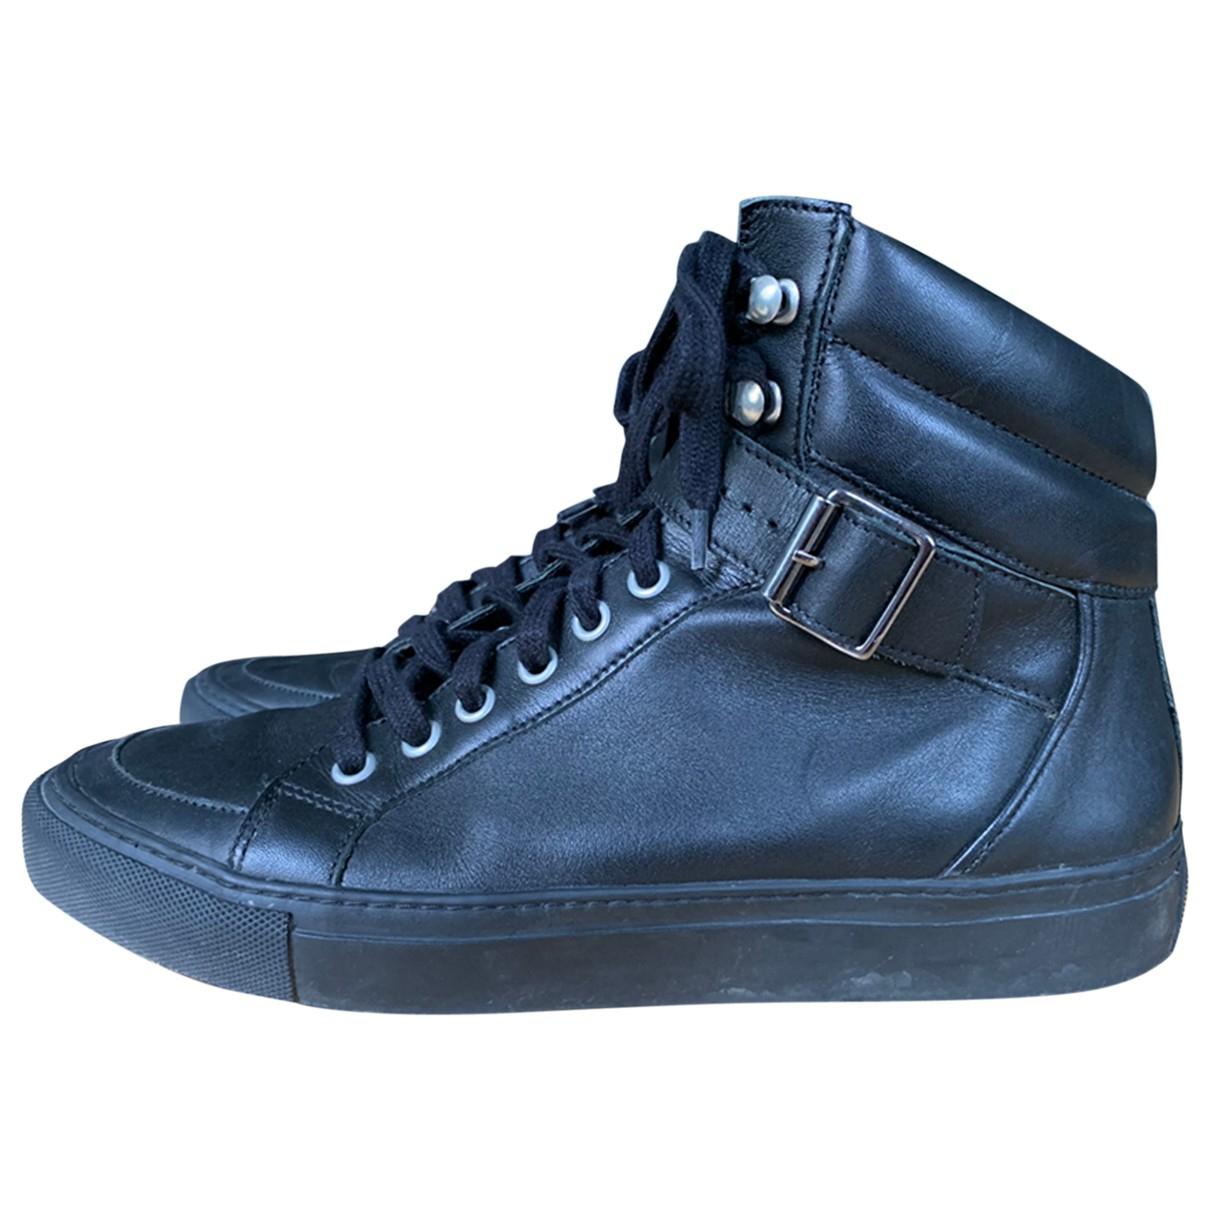 The Kooples \N Black Leather Boots for Men 41 EU